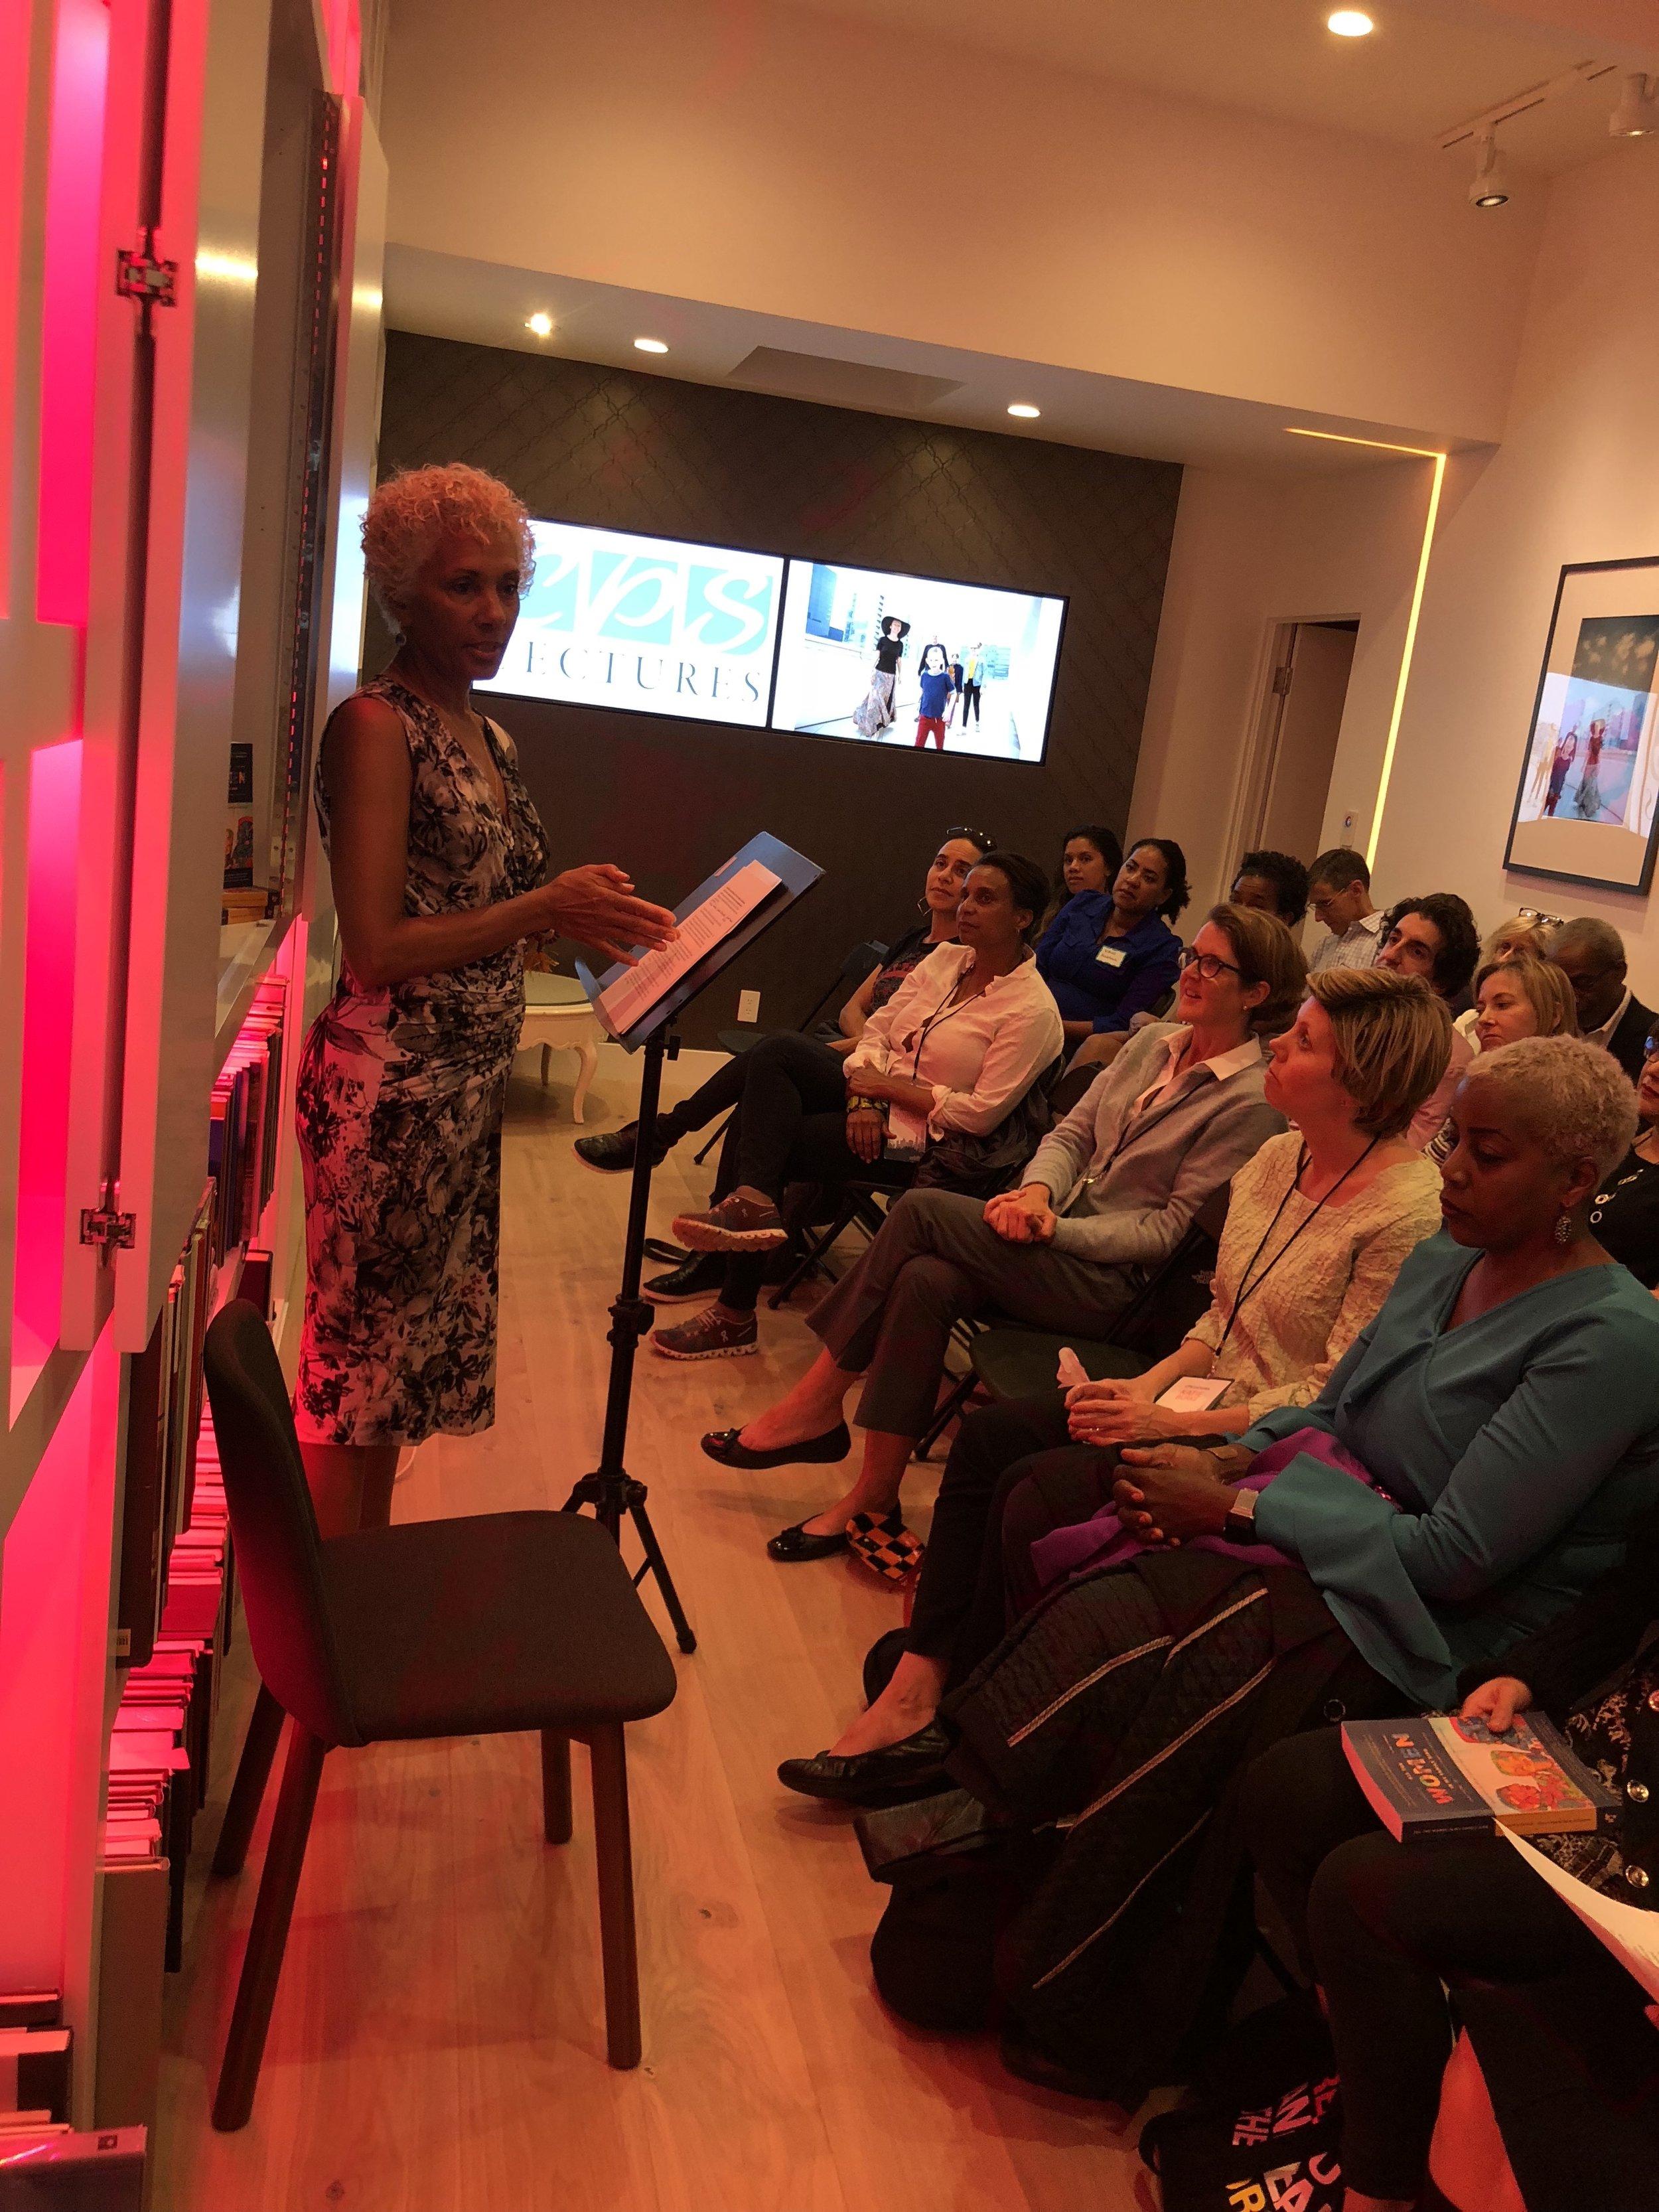 image1 (5)Deborah-KC Event.jpg